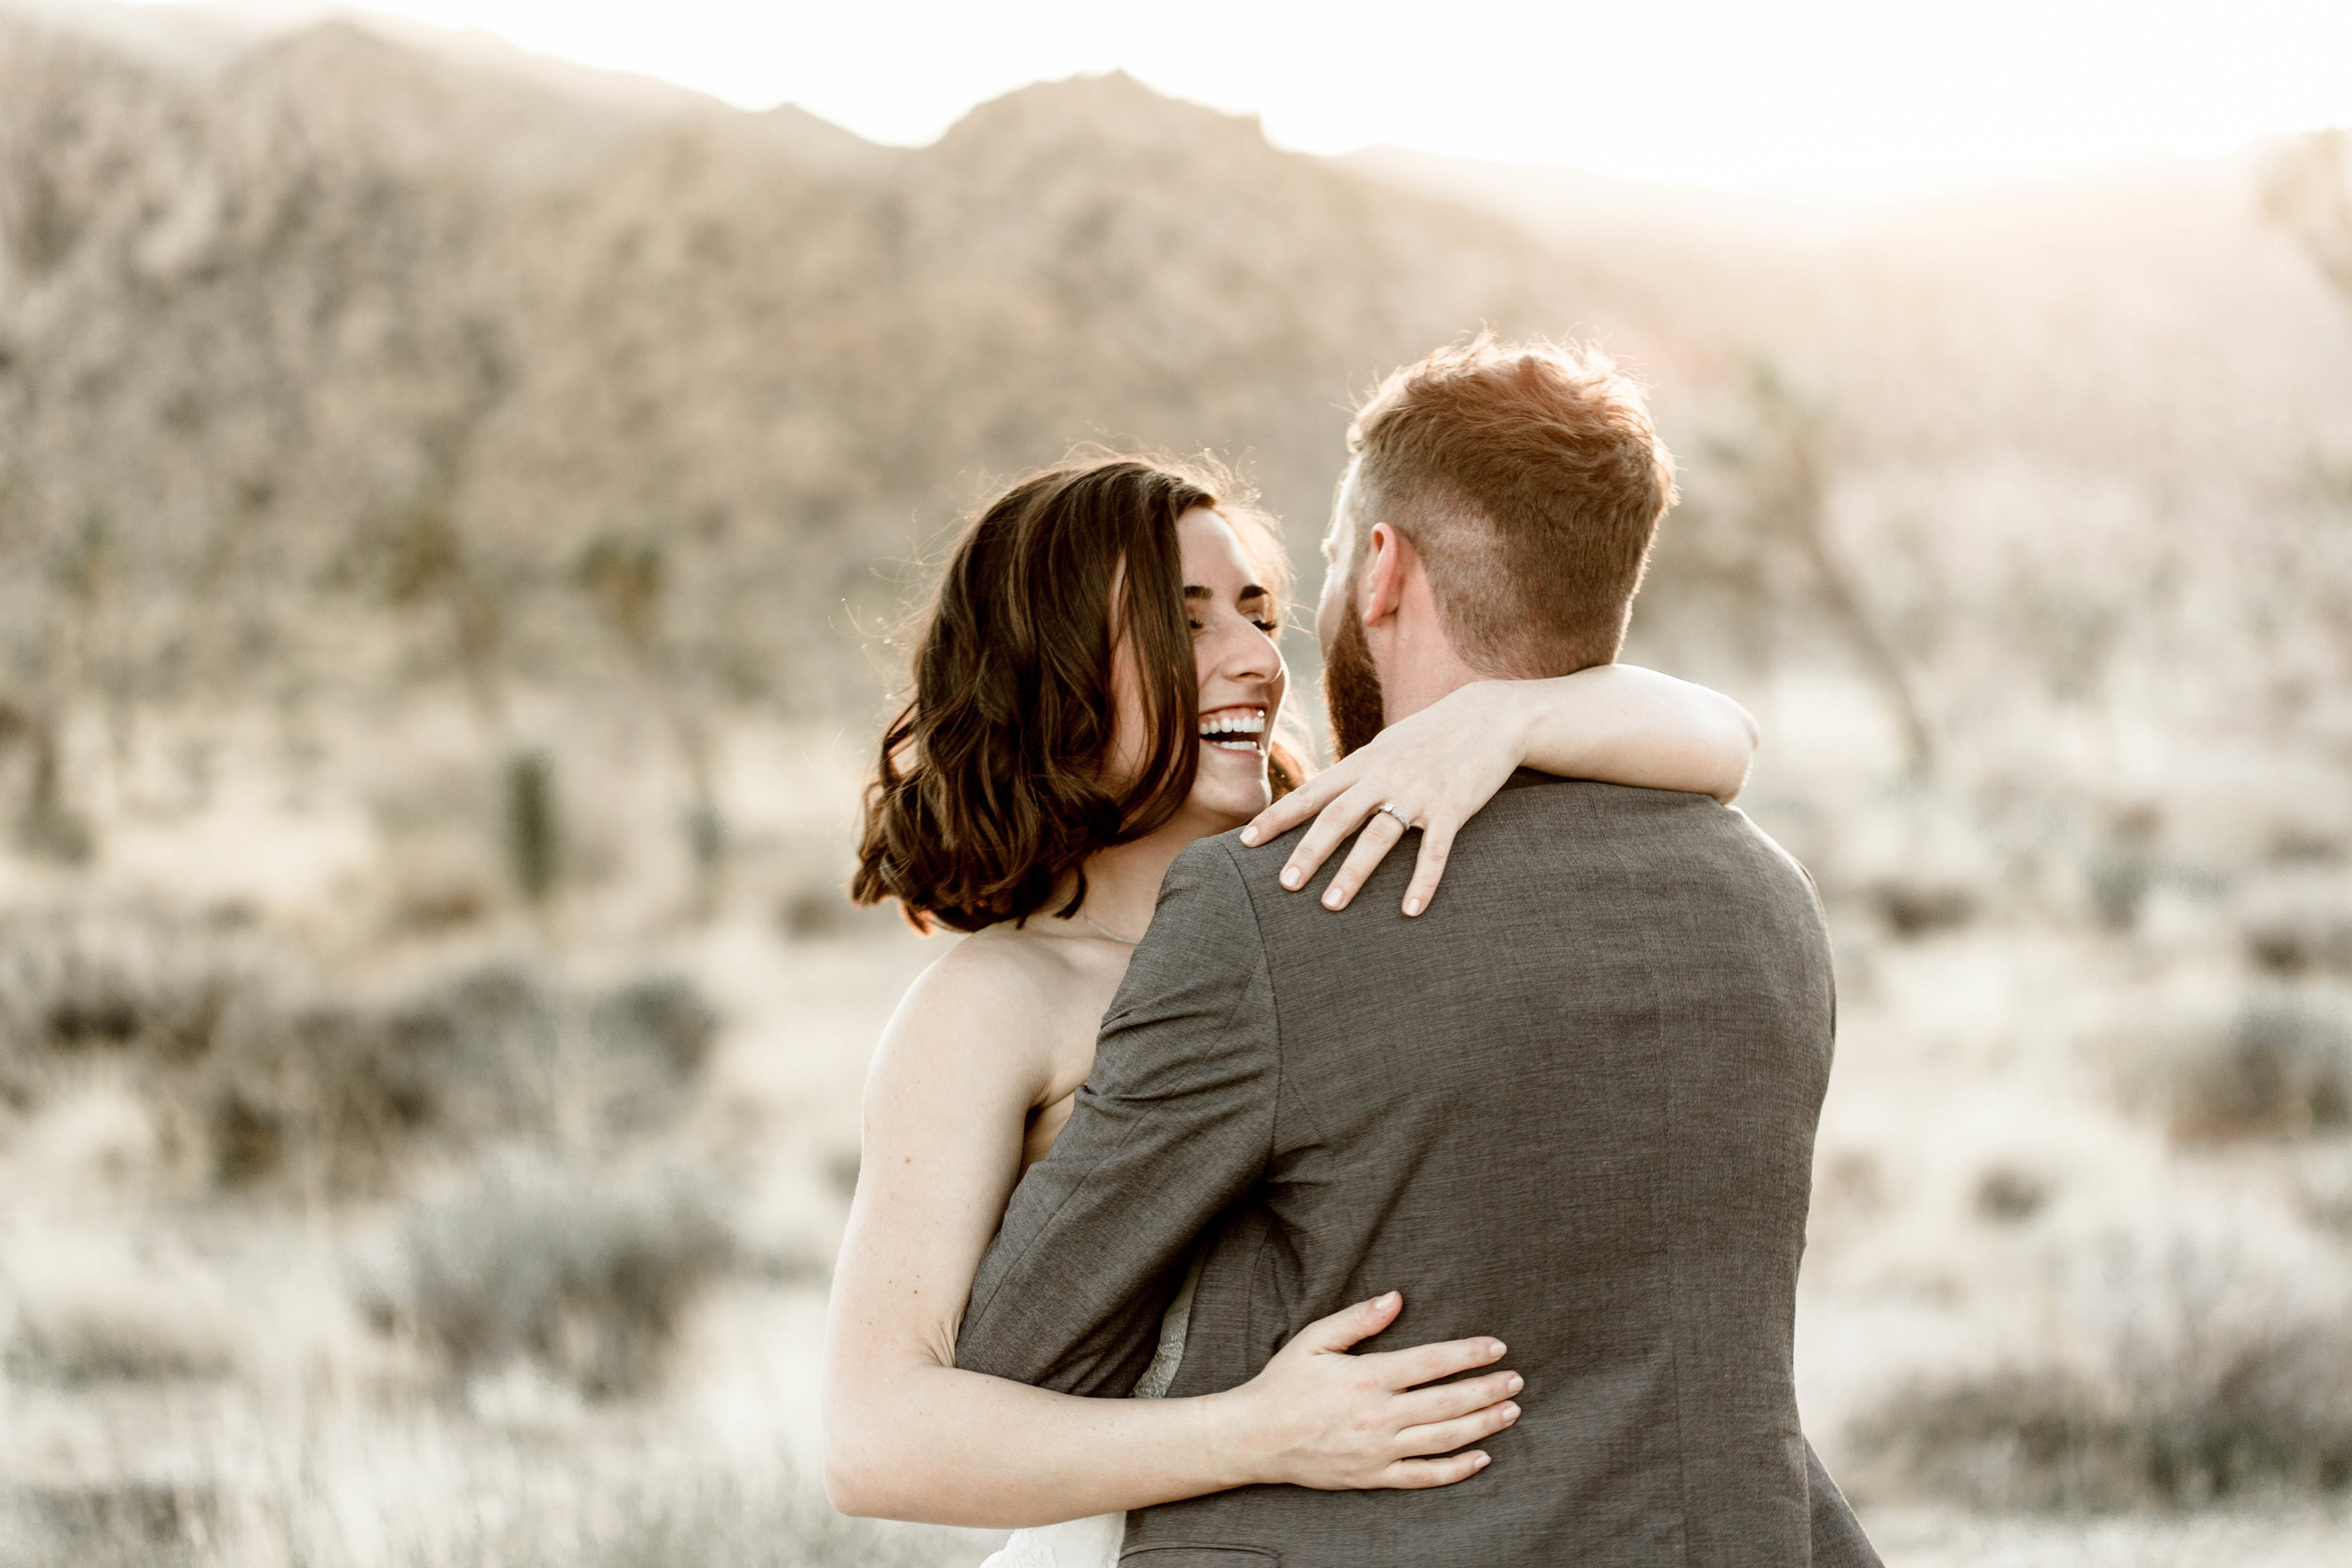 nicole-daacke-photography-joshua-tree-adventurous-elopement-wedding-national-park-wedding-photographer-adventure-wedding-adventurous-elopement-jtree-joshua-tree-national-park-wedding-photographer-intimate-weddings-golden-desert-love-27.jpg